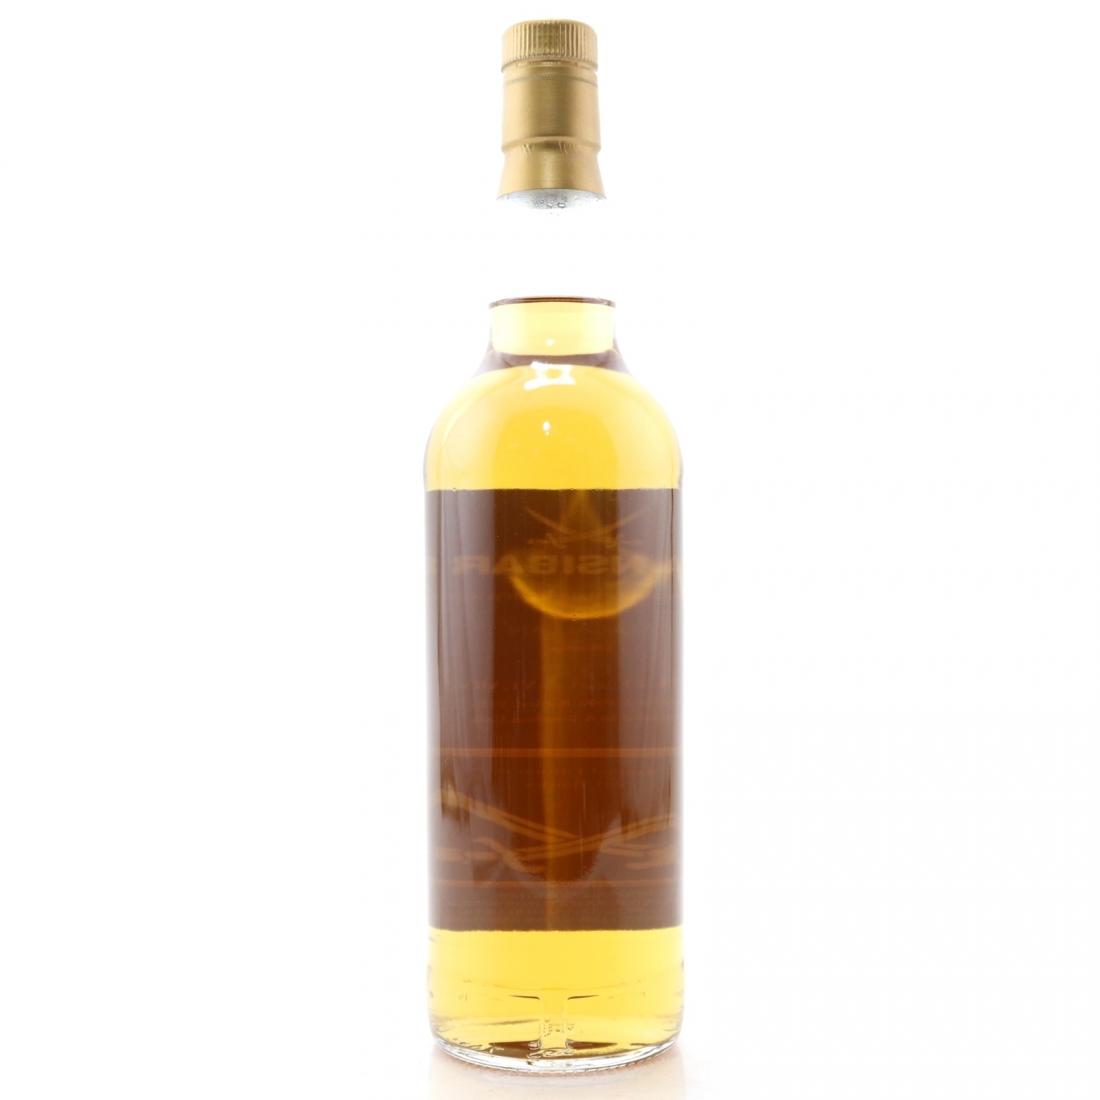 Macallan 1989 Sansibar 25 Year Old / Spirits Shop' Selection